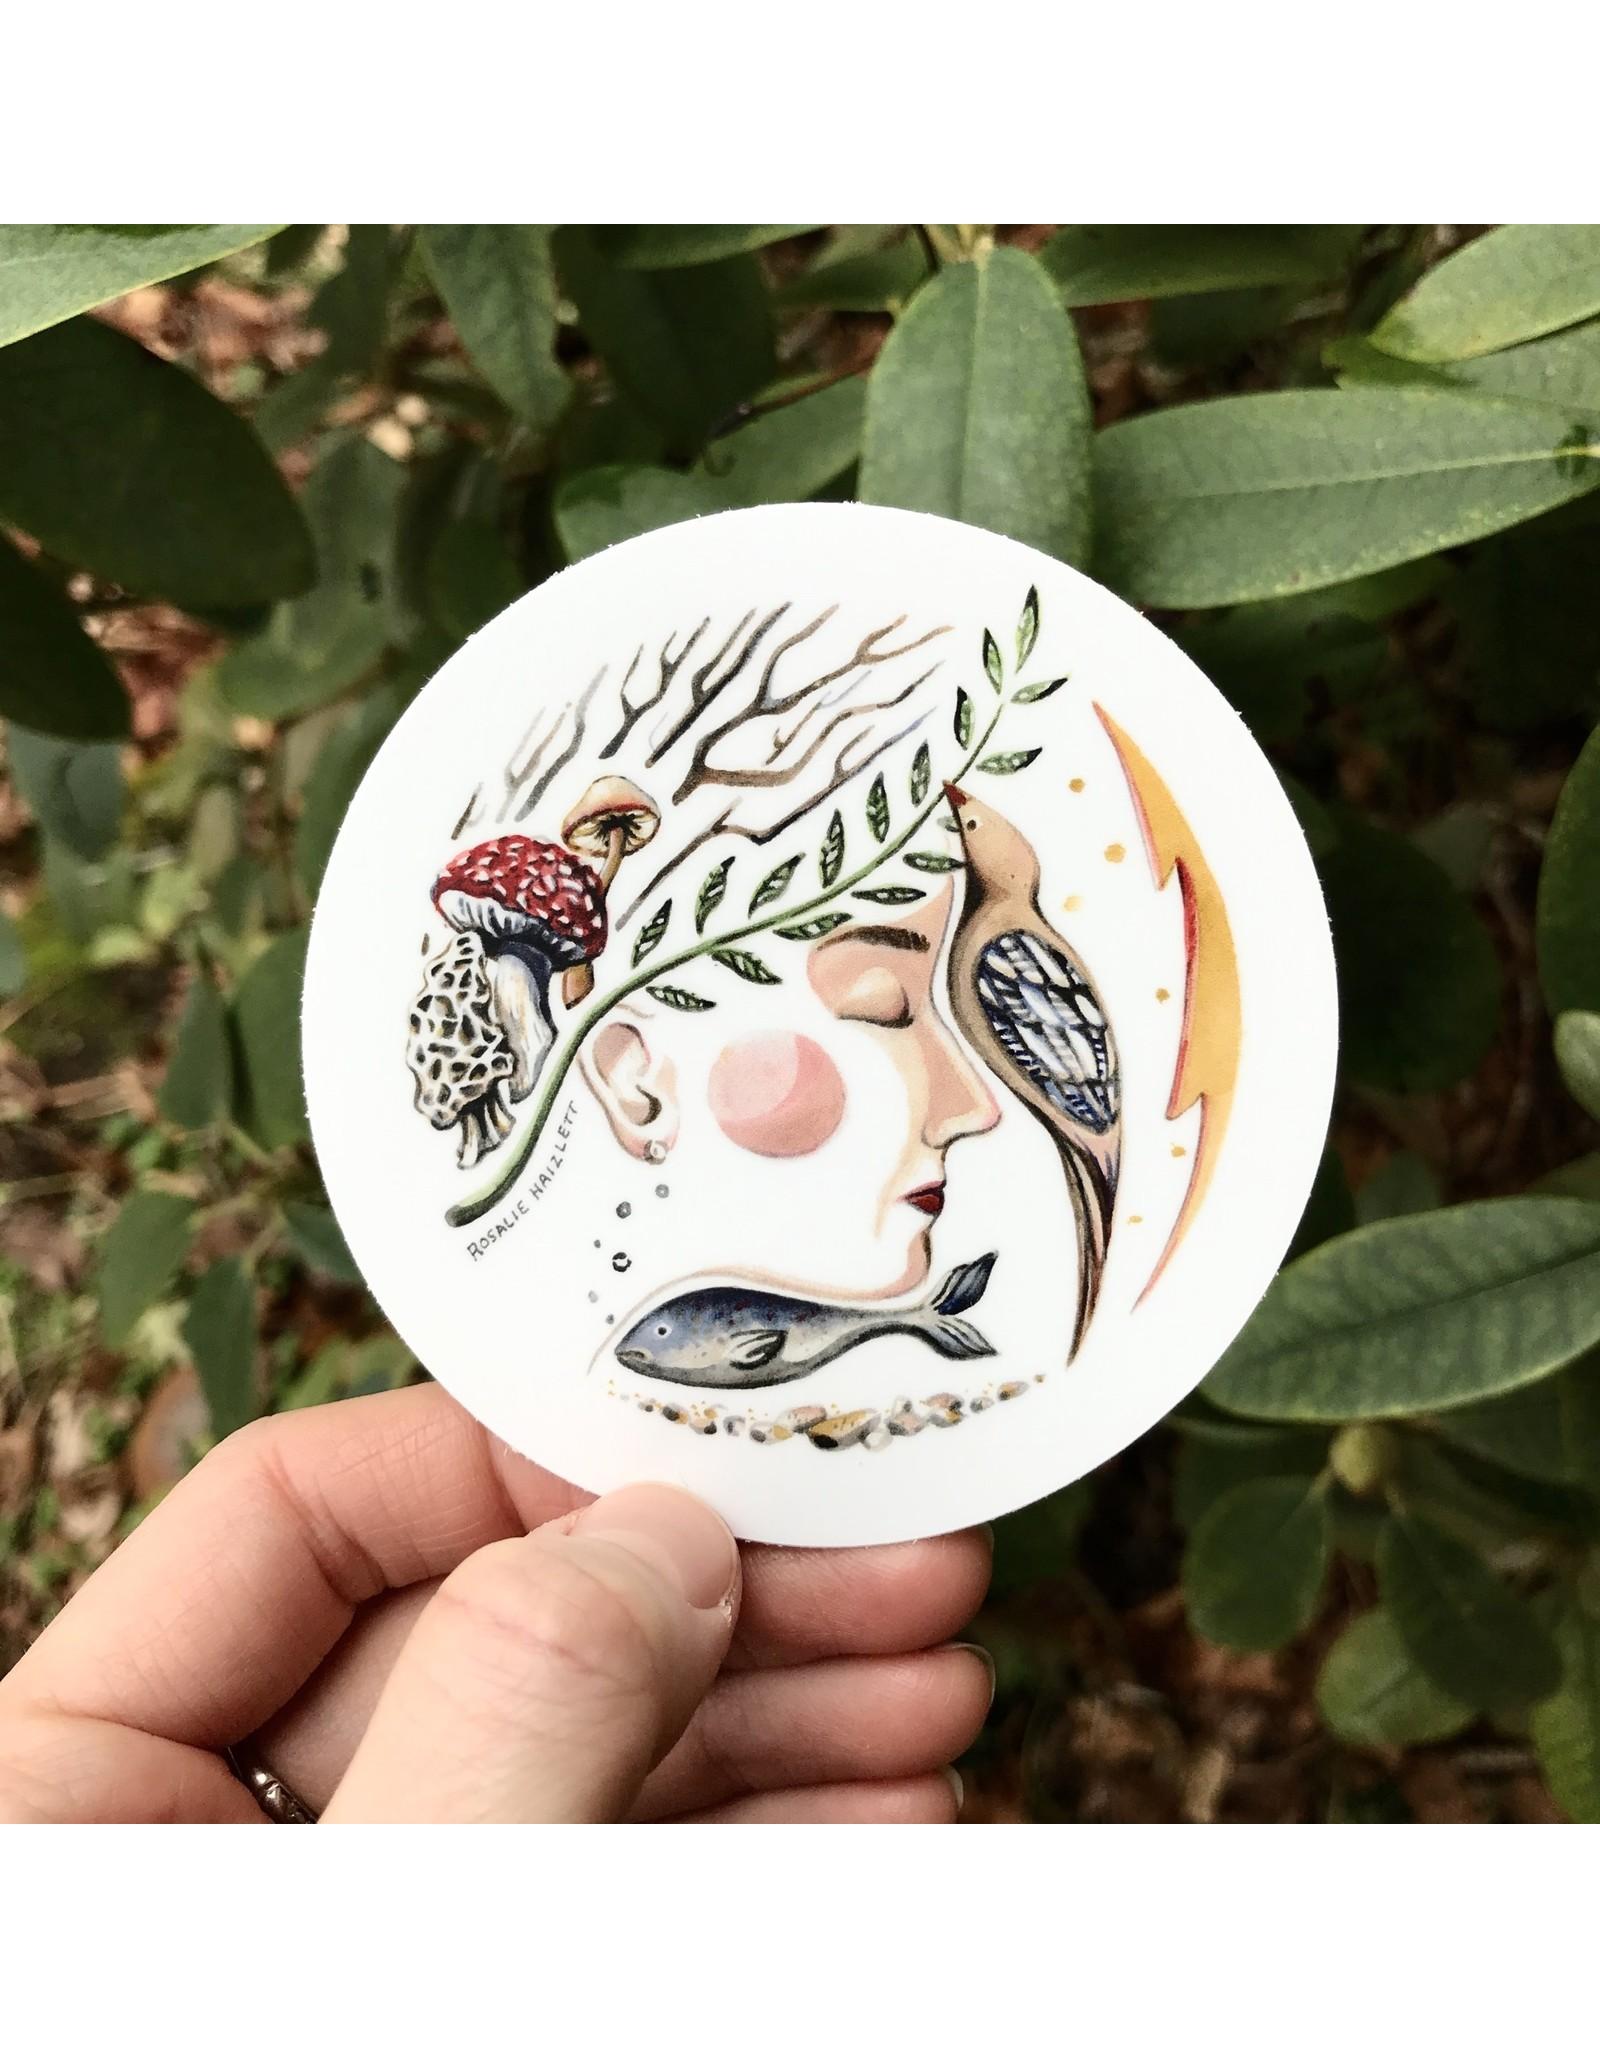 Rosalie Haizlett Waterproof Outdoor Stickers